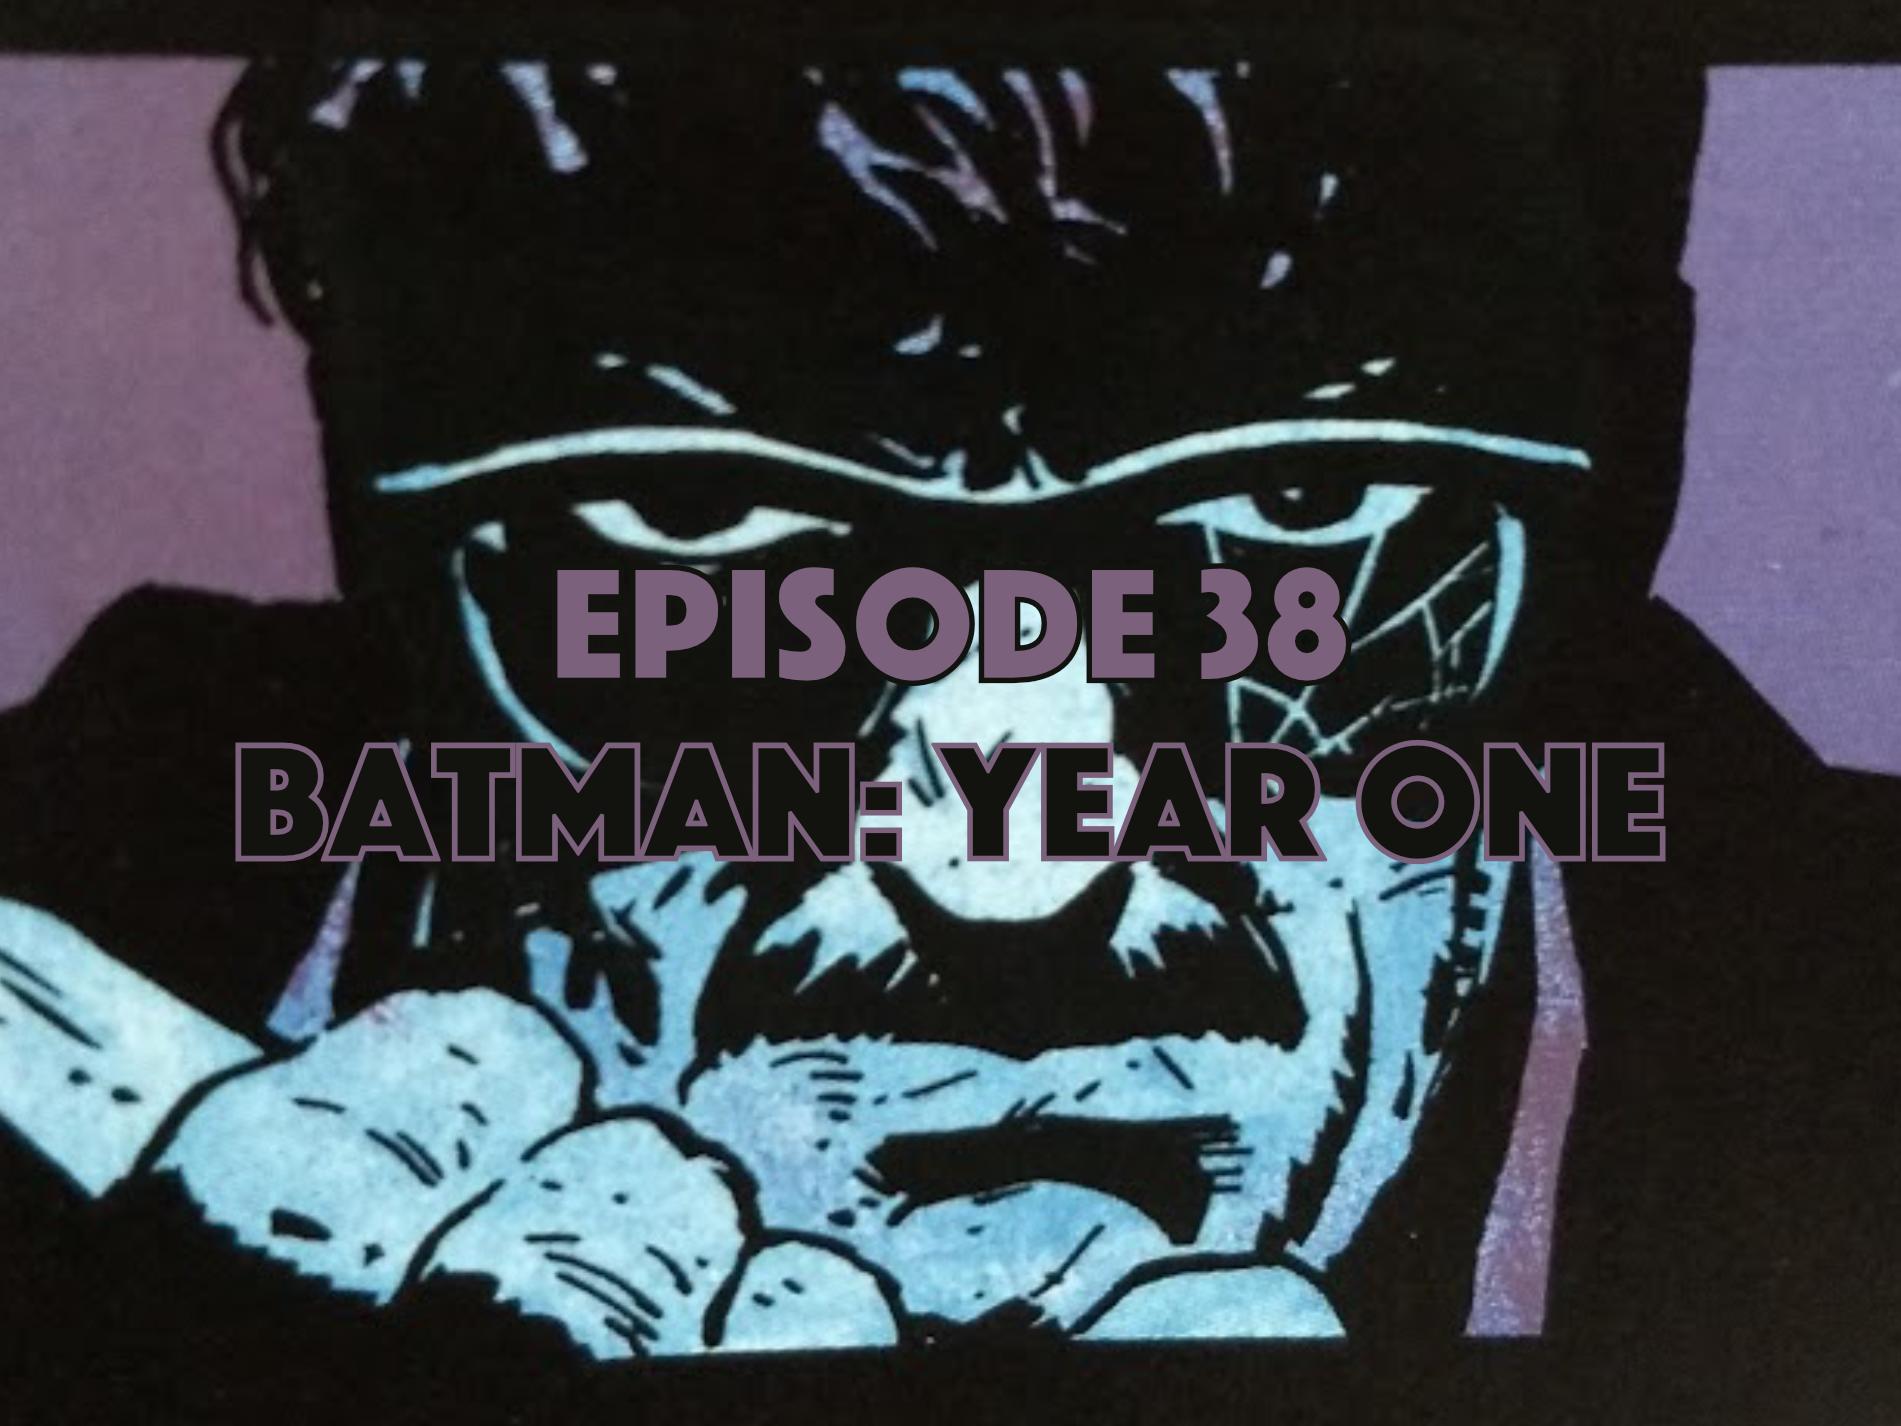 Batman, Batman Year One, Graphic Novel, Graphic Novel Podcast, Comic Book, Comic Book Podcast, Graphic Novel Explorers Club,